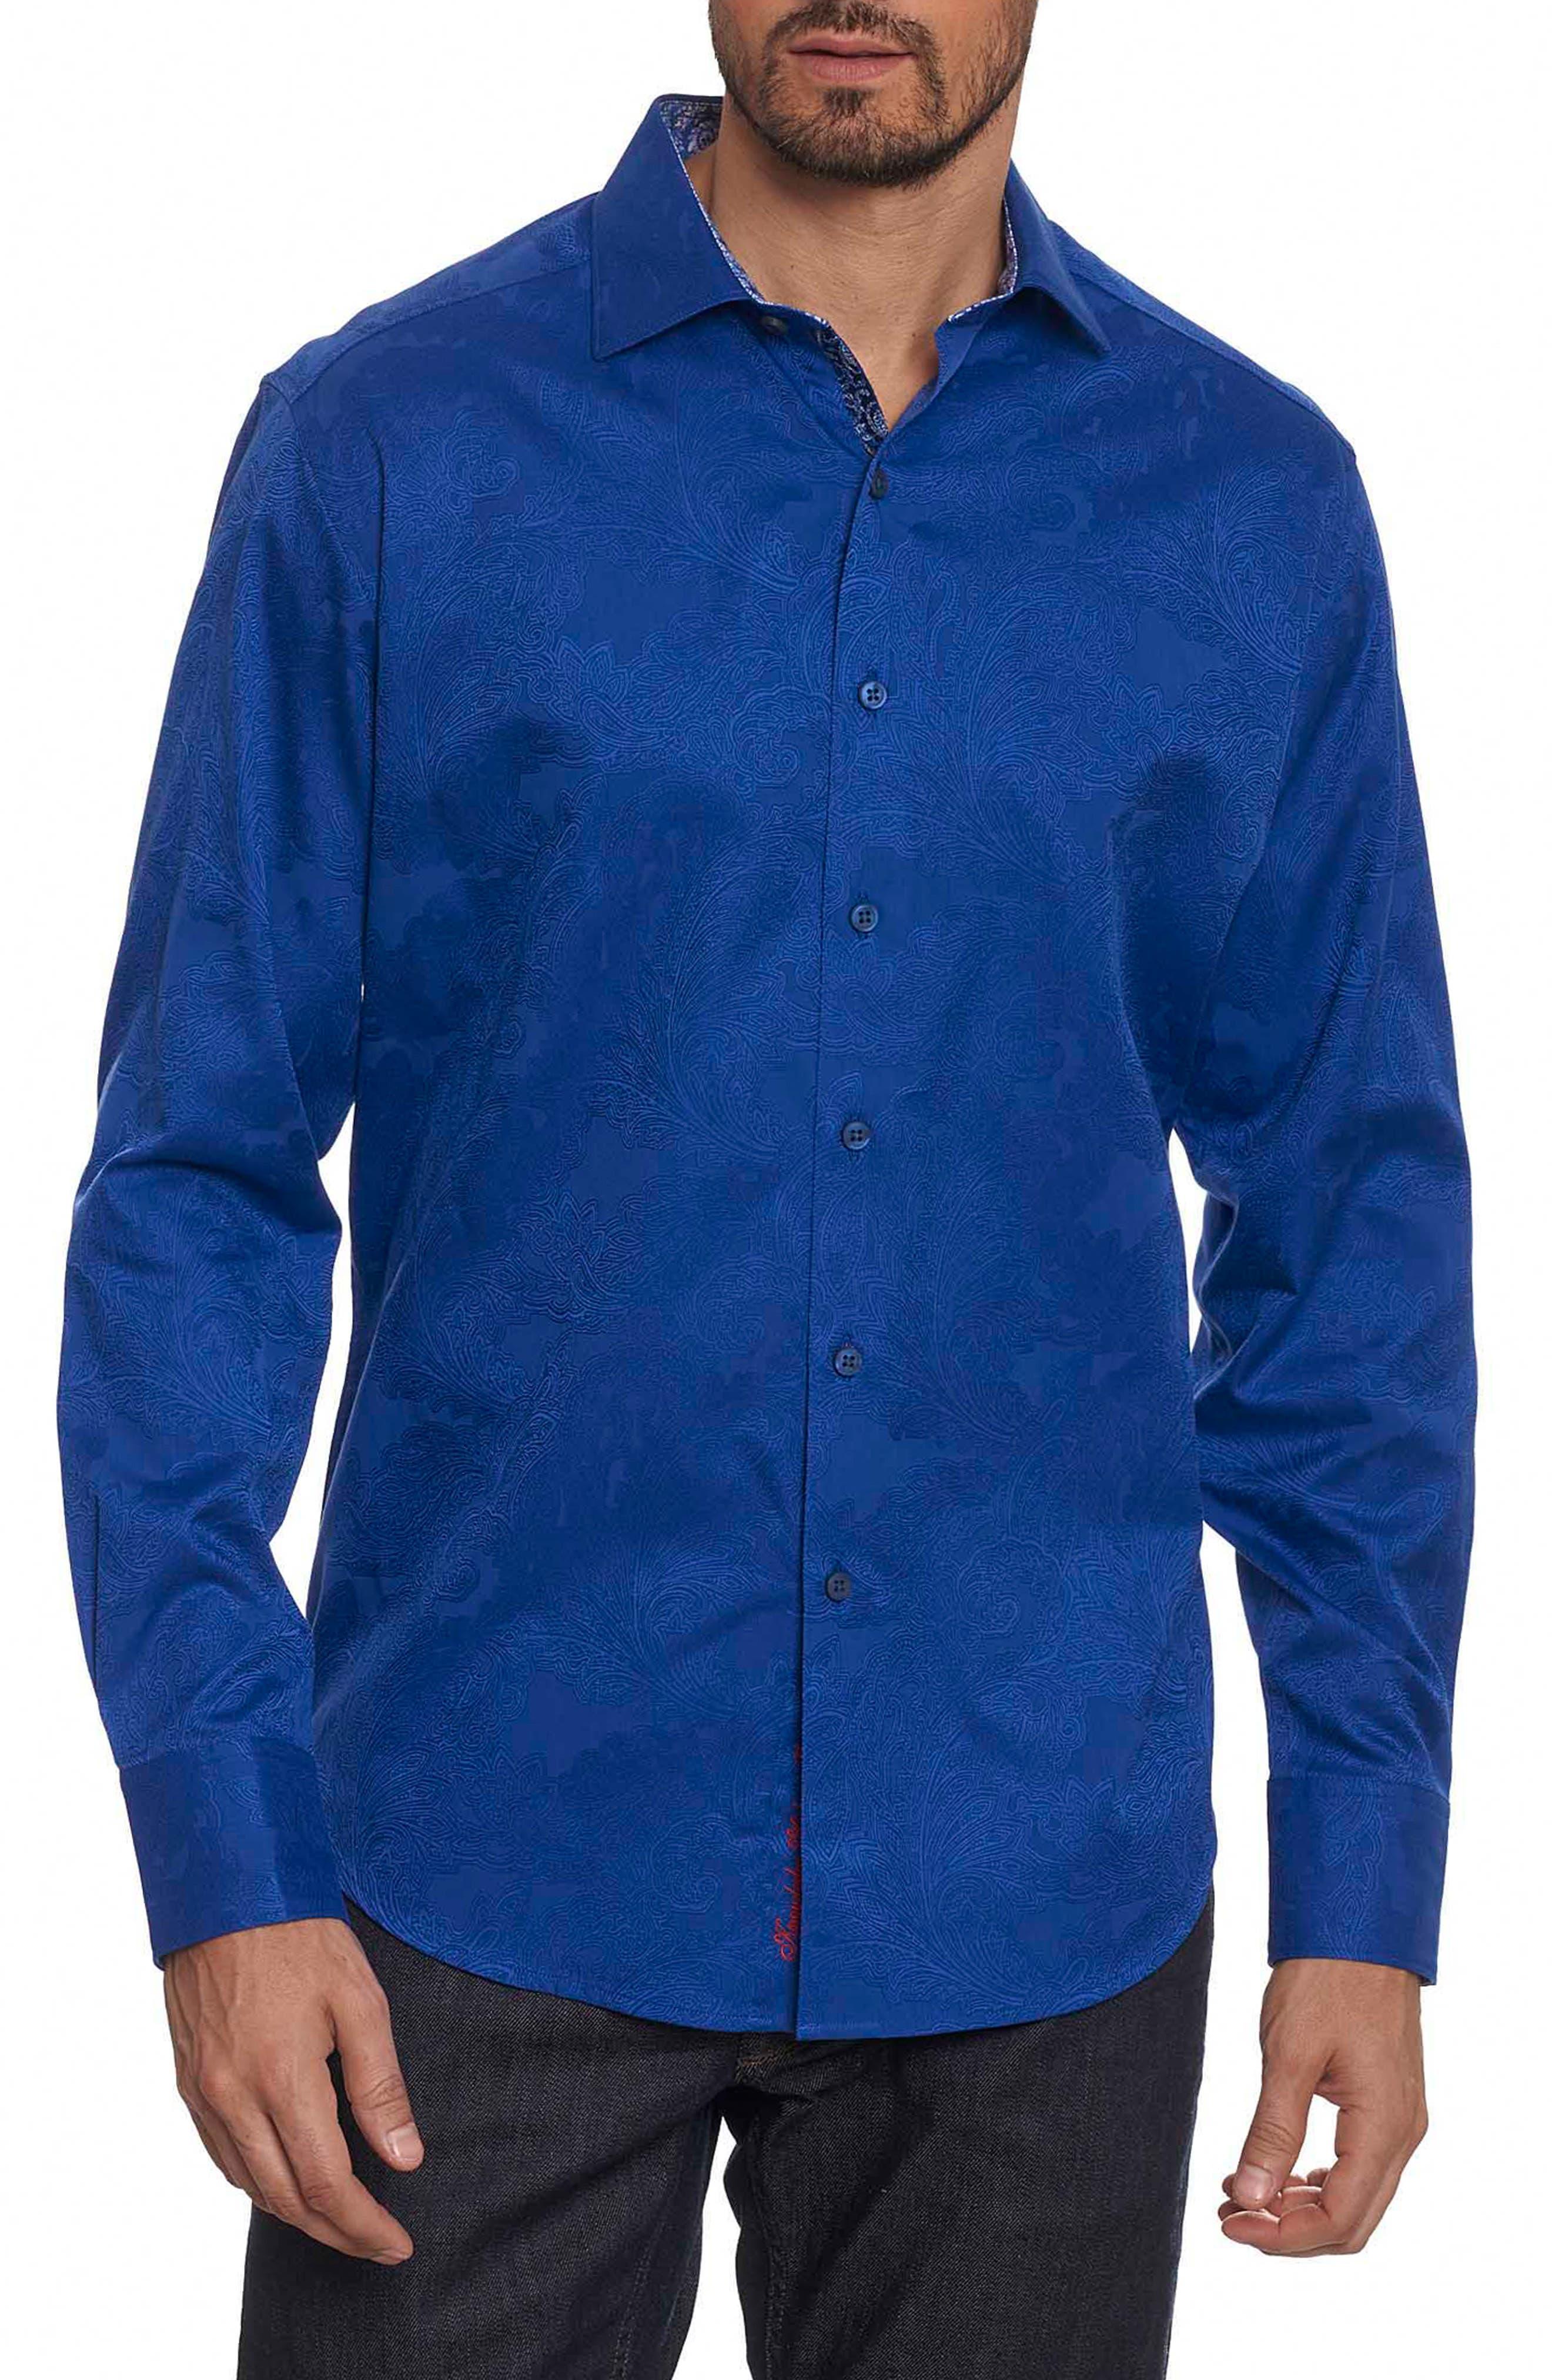 Rosendale Classic Fit Jacquard Sport Shirt,                         Main,                         color, Cobalt